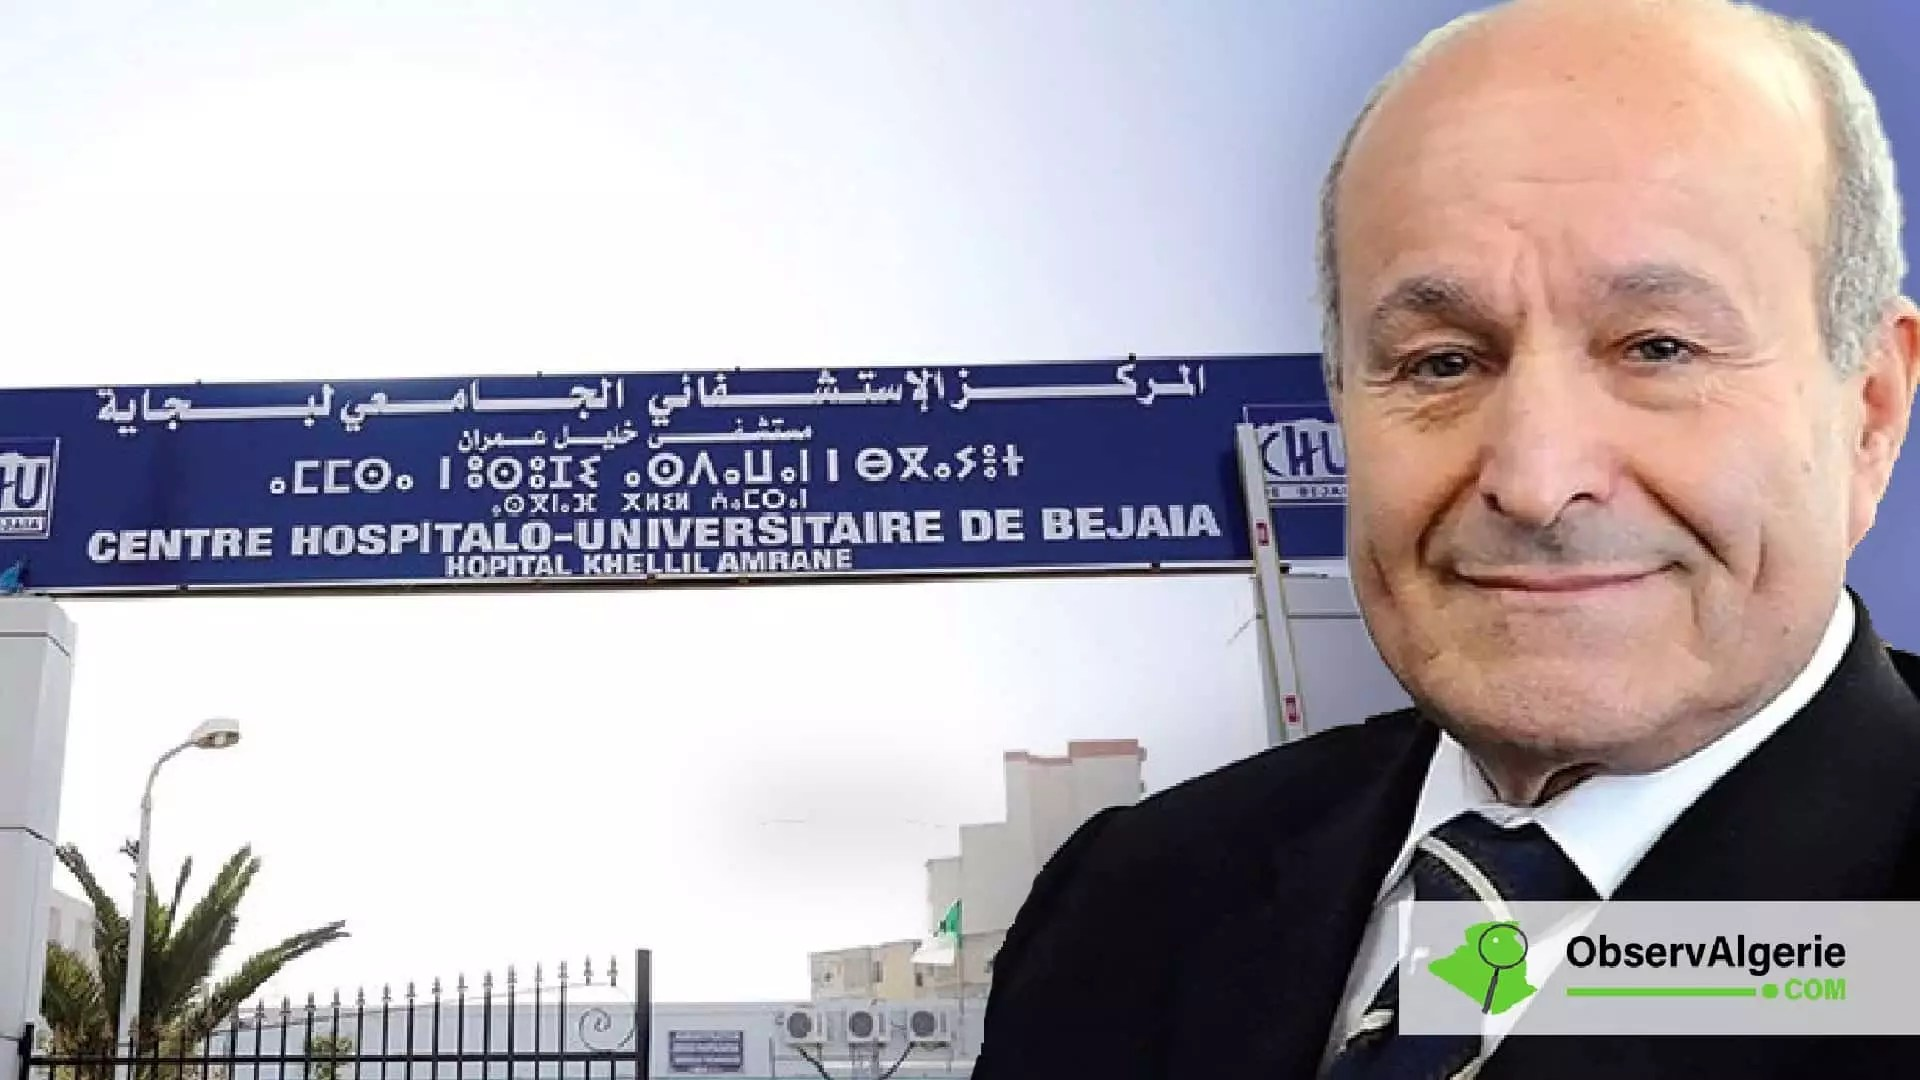 Observ'Algérie cover image